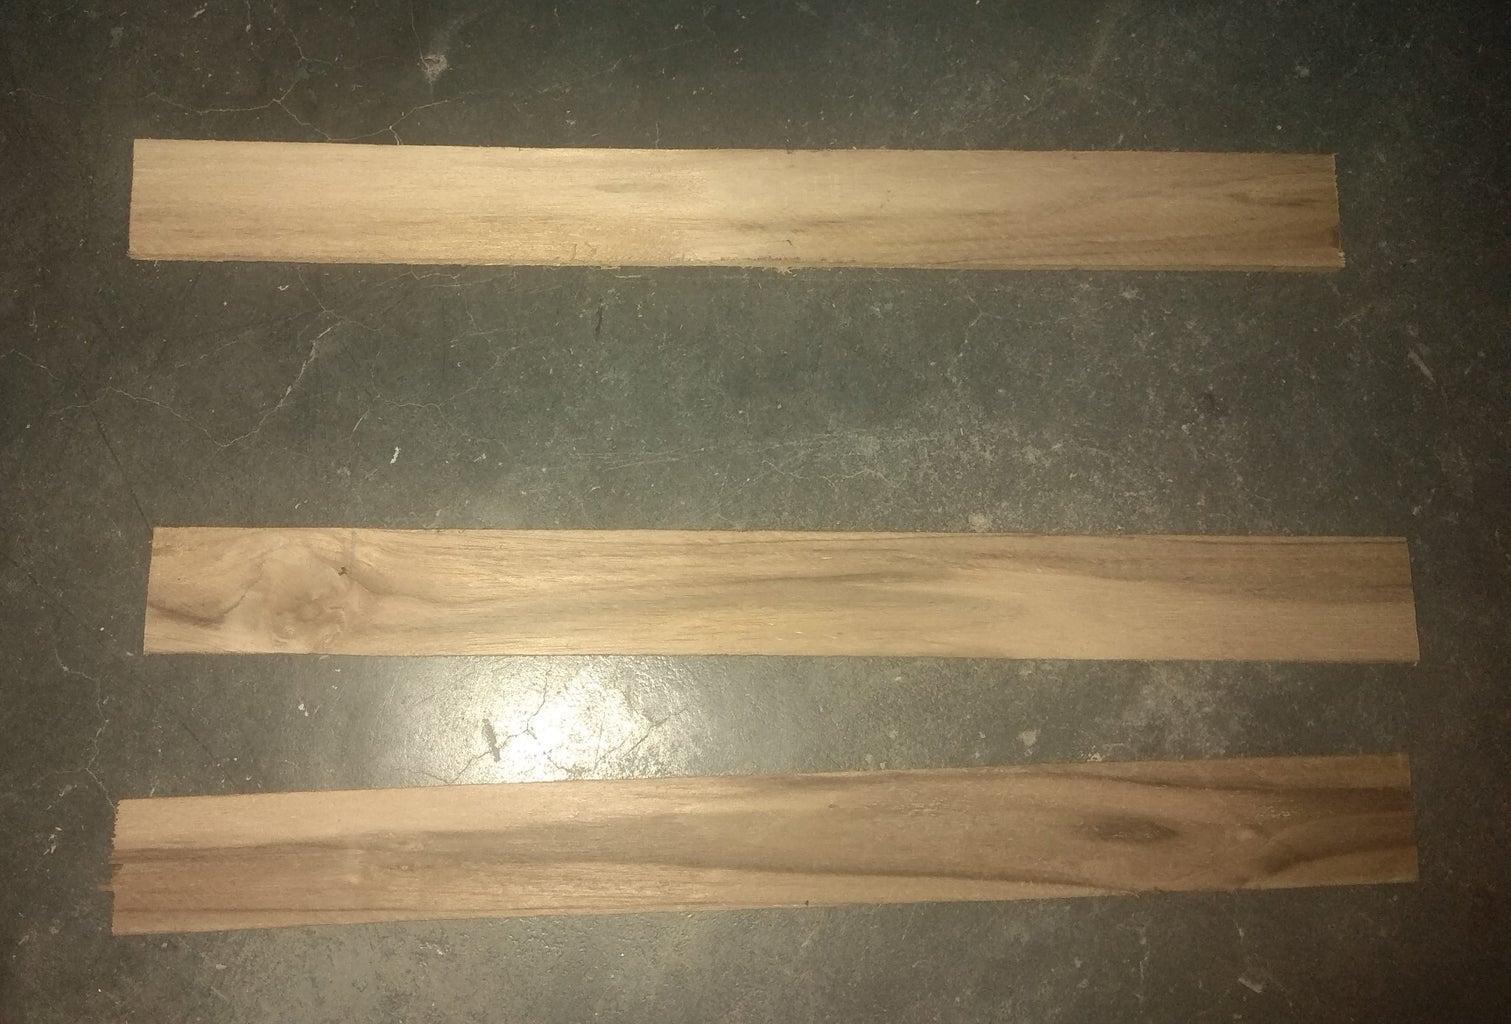 Cut Three Small Wood Pieces